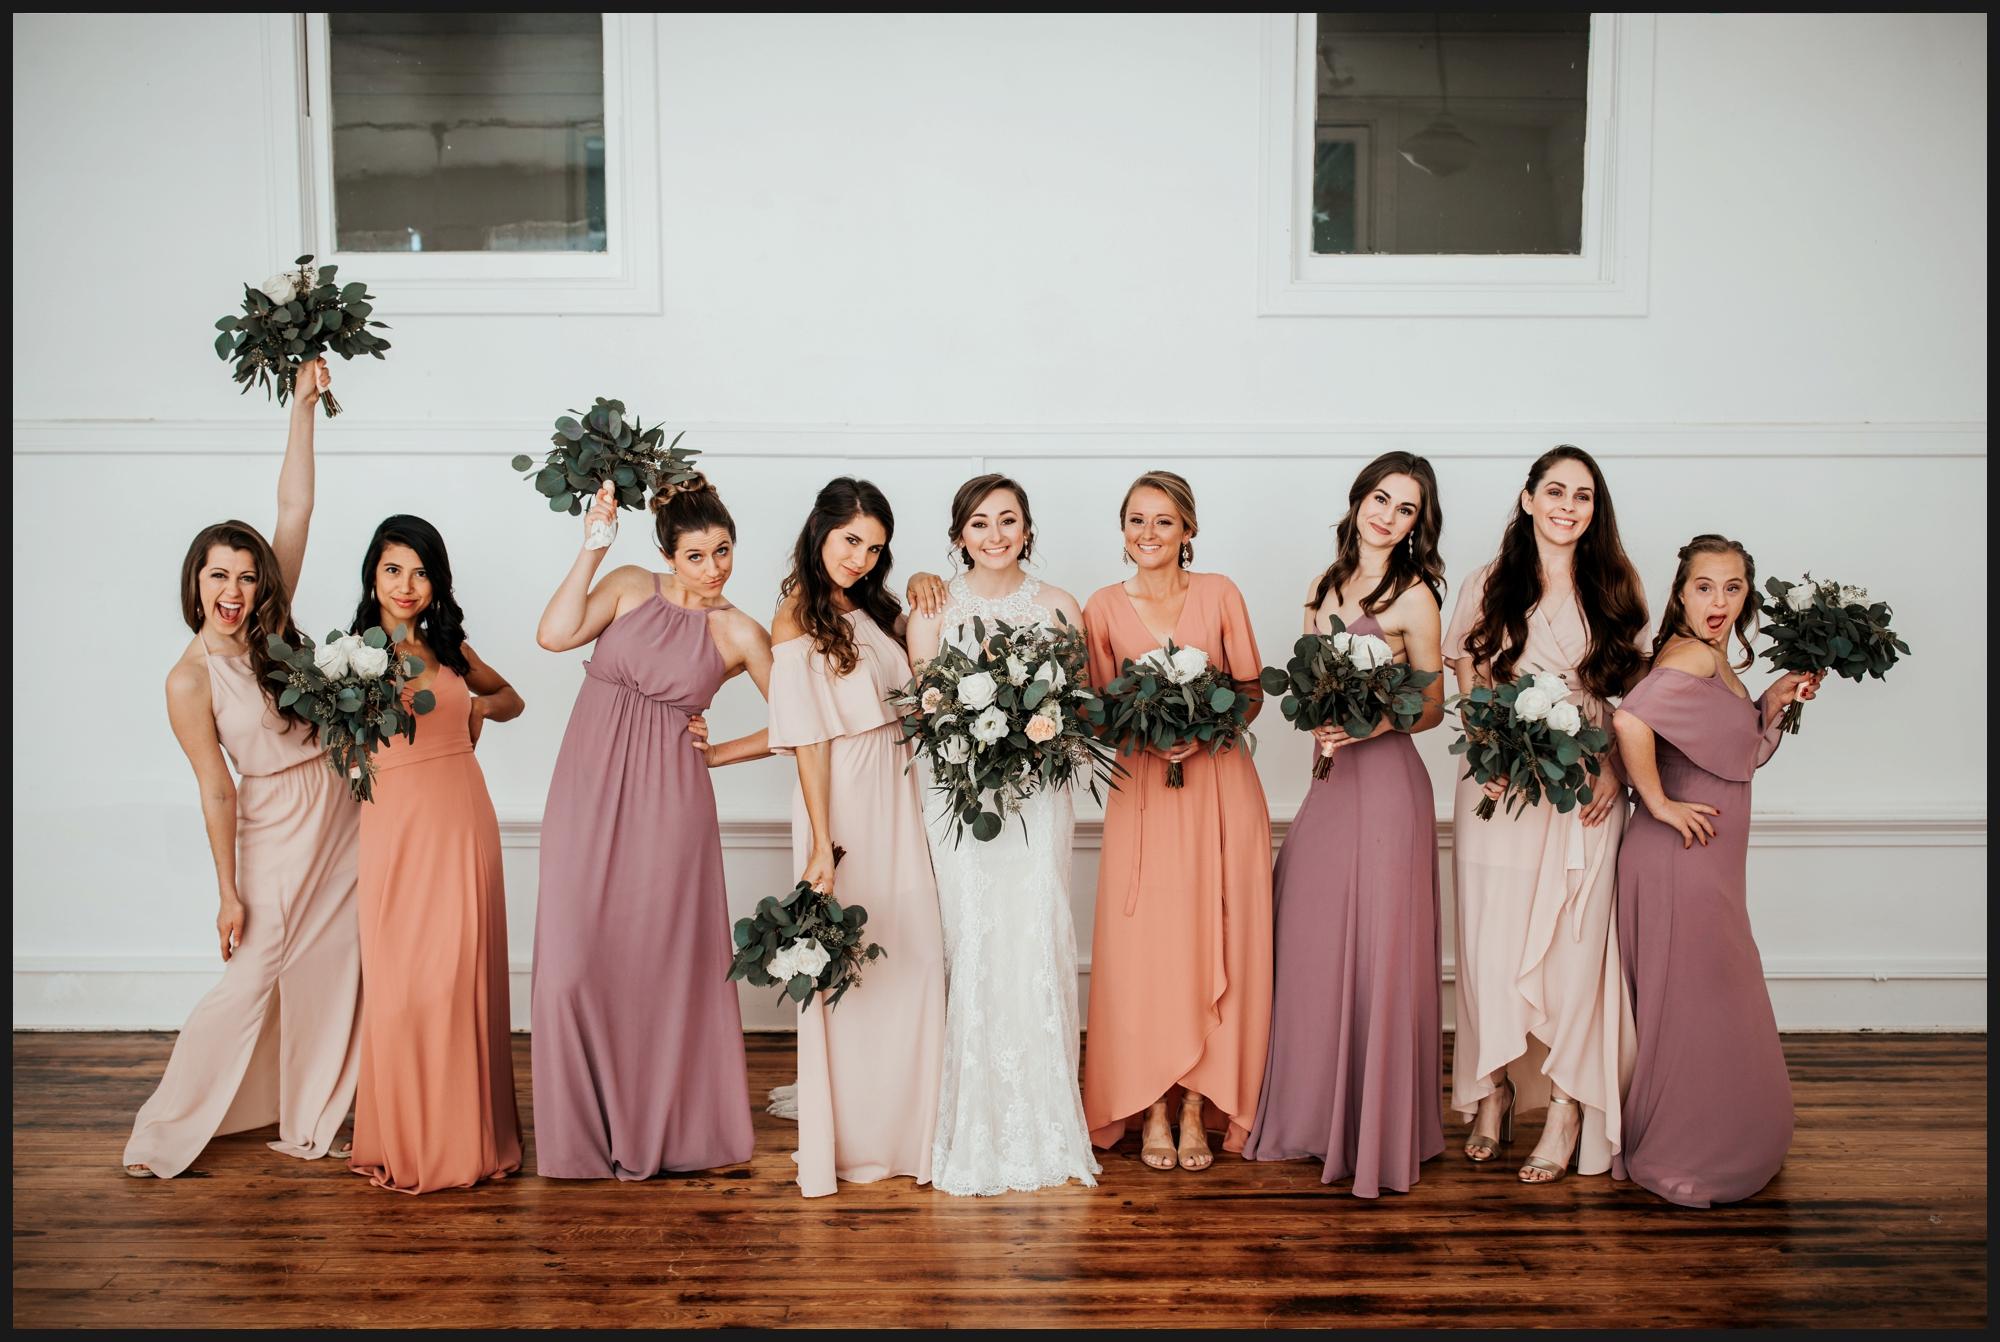 Orlando-Wedding-Photographer-destination-wedding-photographer-florida-wedding-photographer-bohemian-wedding-photographer_1737.jpg